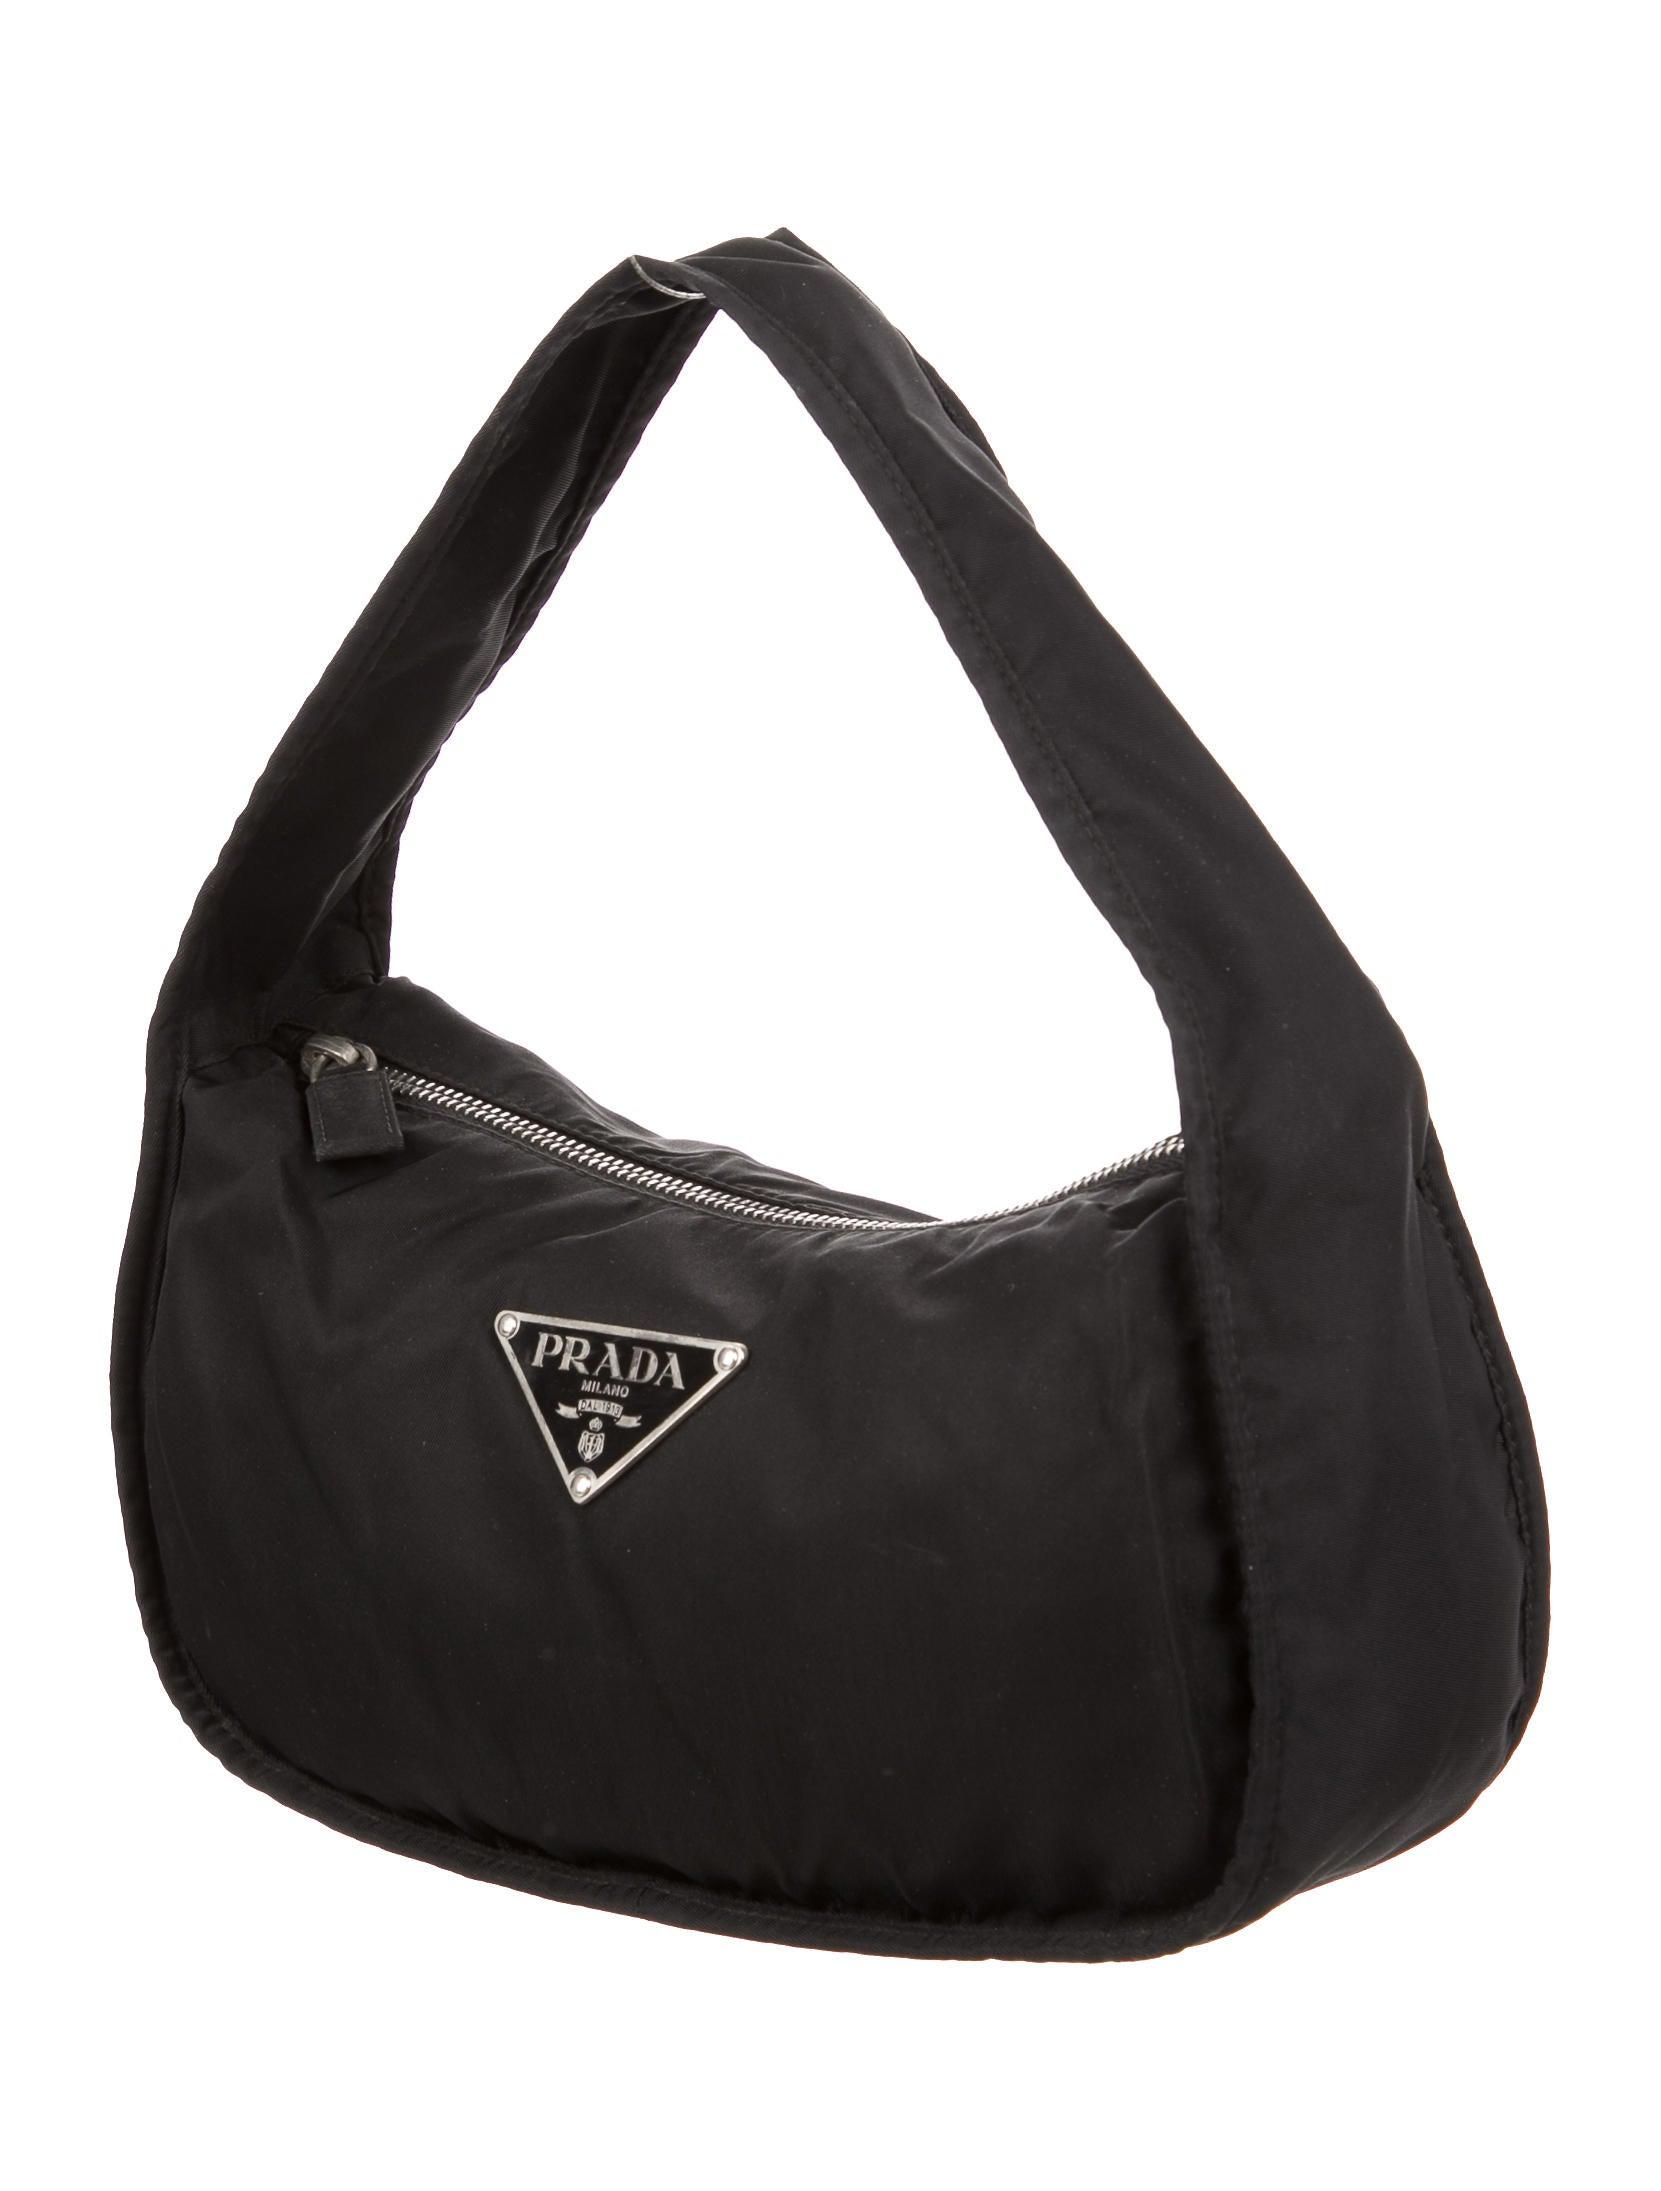 3e0af4b45edb ... low price lyst prada tessuto mini bucket crossbody bag in blue new  product ed042 64dc1 e73d6